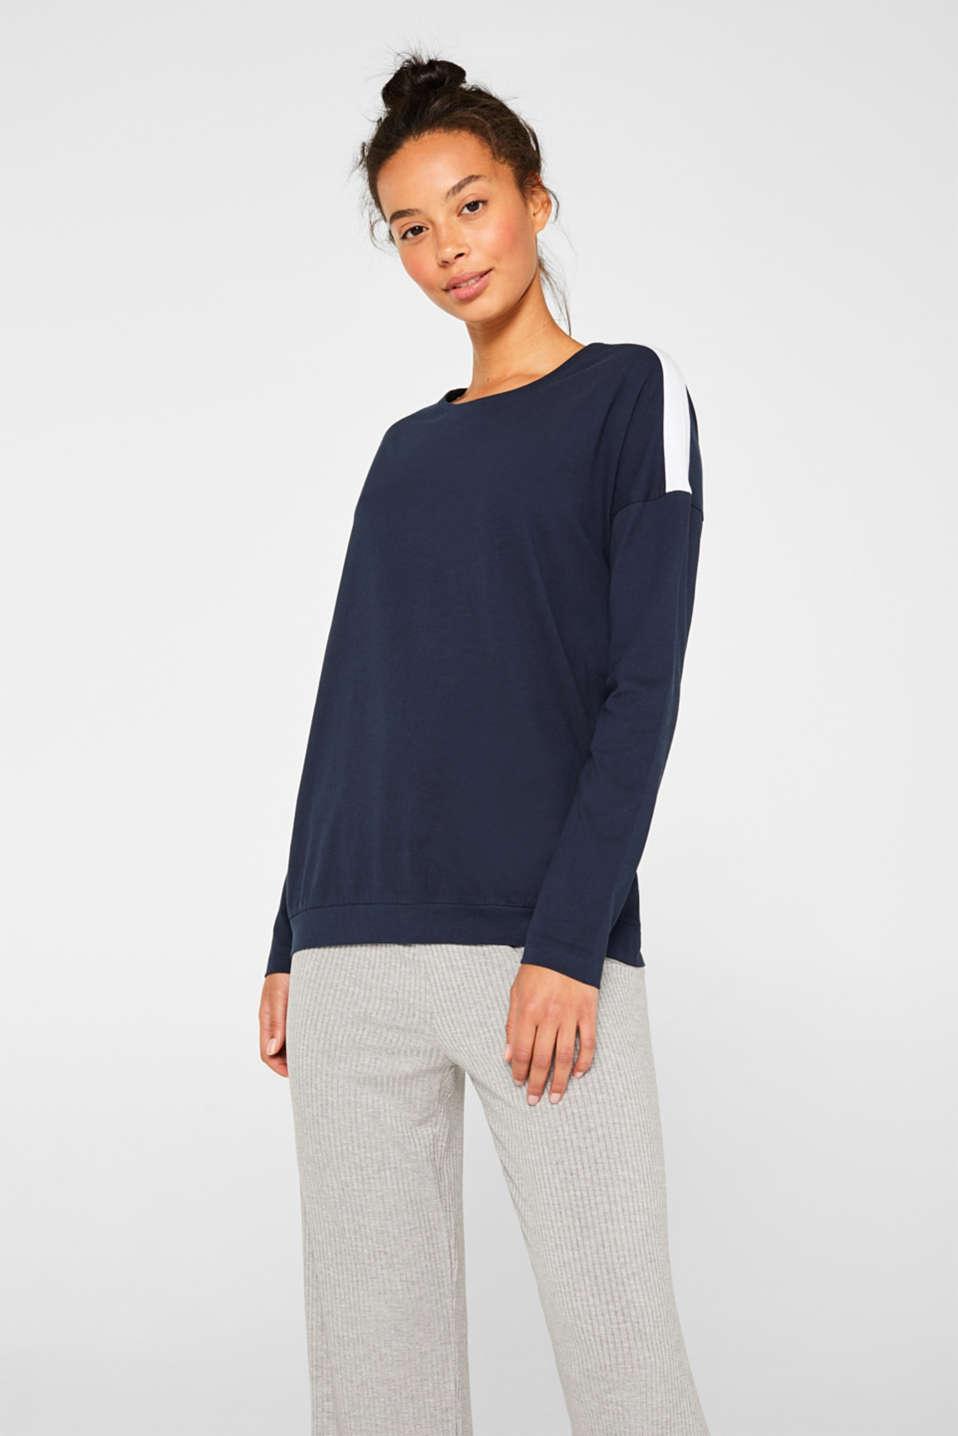 Stripe detail long sleeve top, 100% cotton